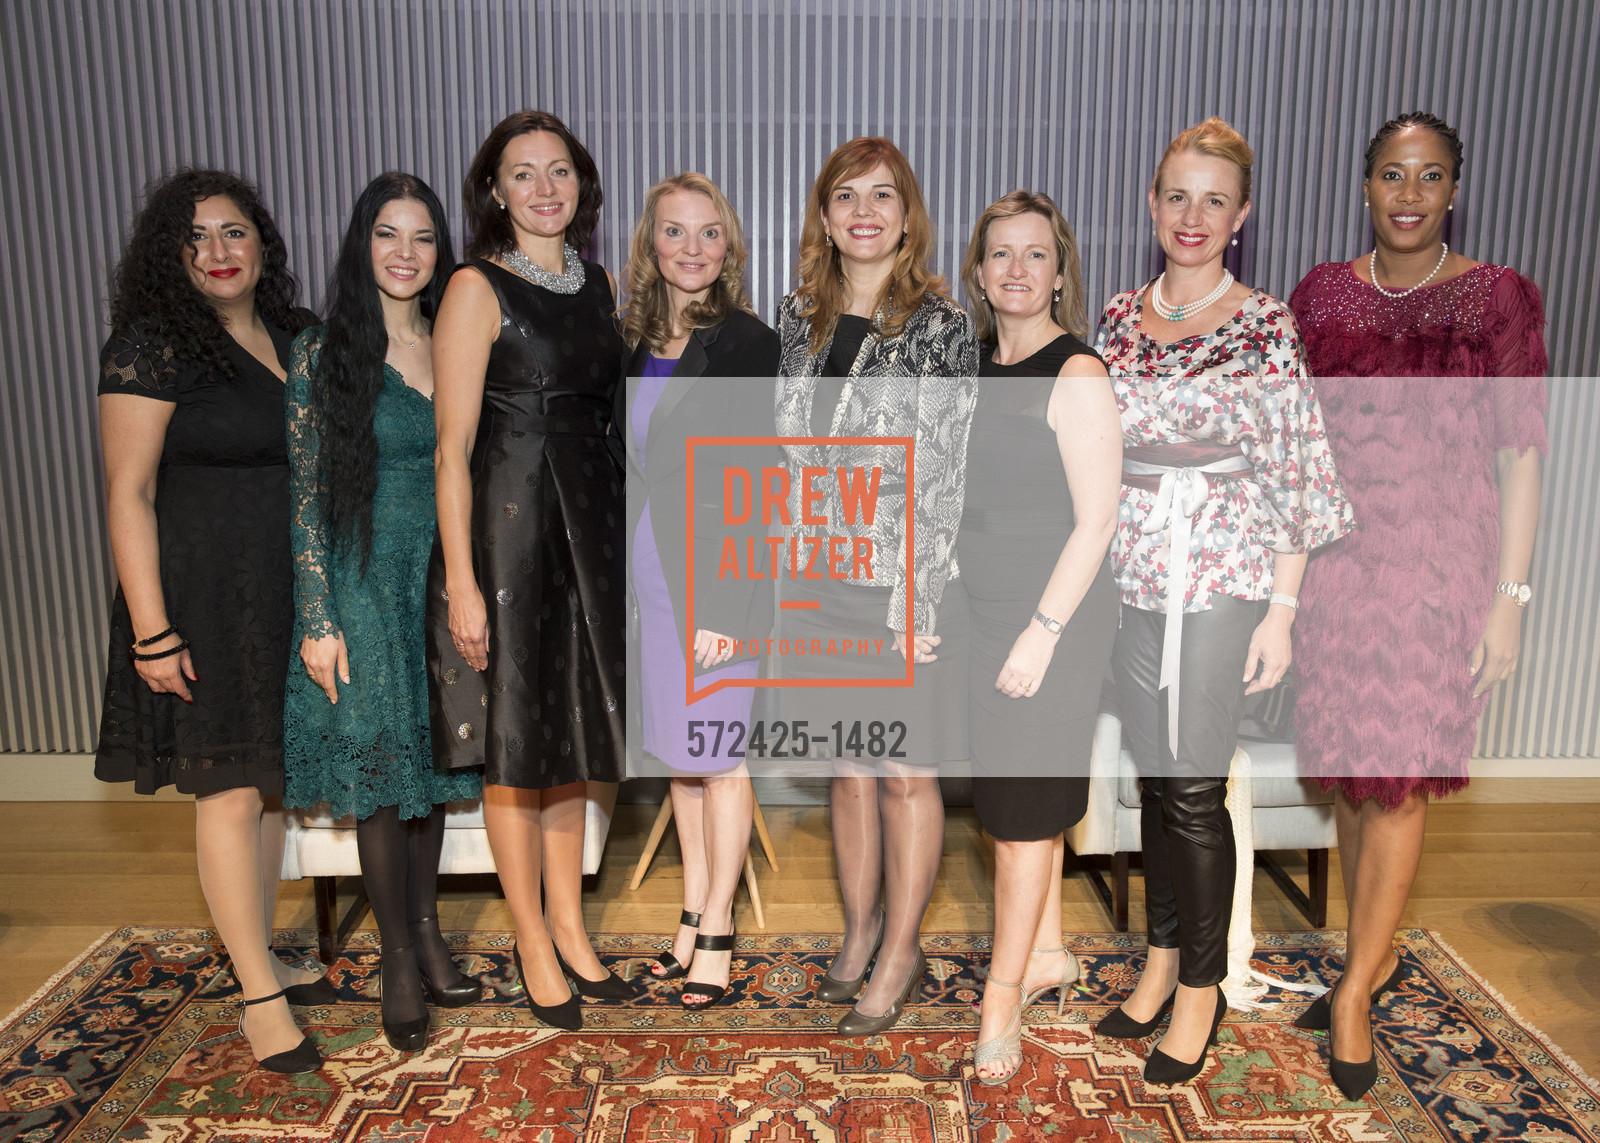 Baljeet Sandhu, Ana Birchala, Aleks Gren, Alyse Nelson, Biljana Dakich, Farril Fitzpatrick, Daria TatajOzor, Photo #572425-1482